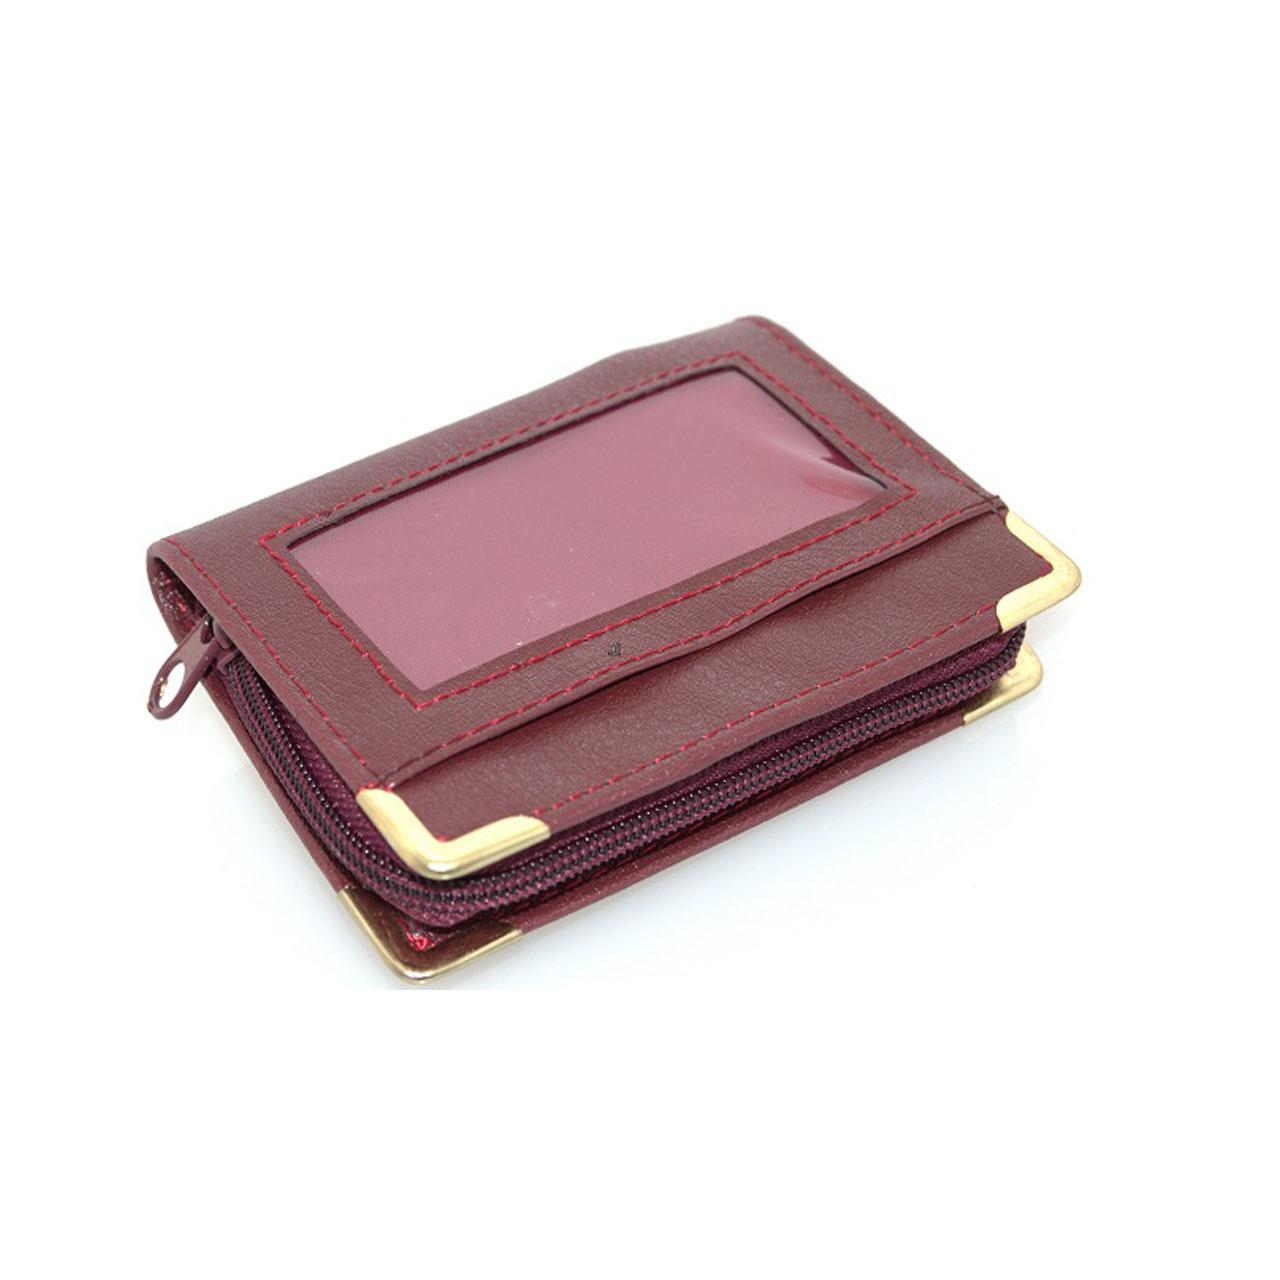 قیمت کیف کارت ویزیت مدل C180